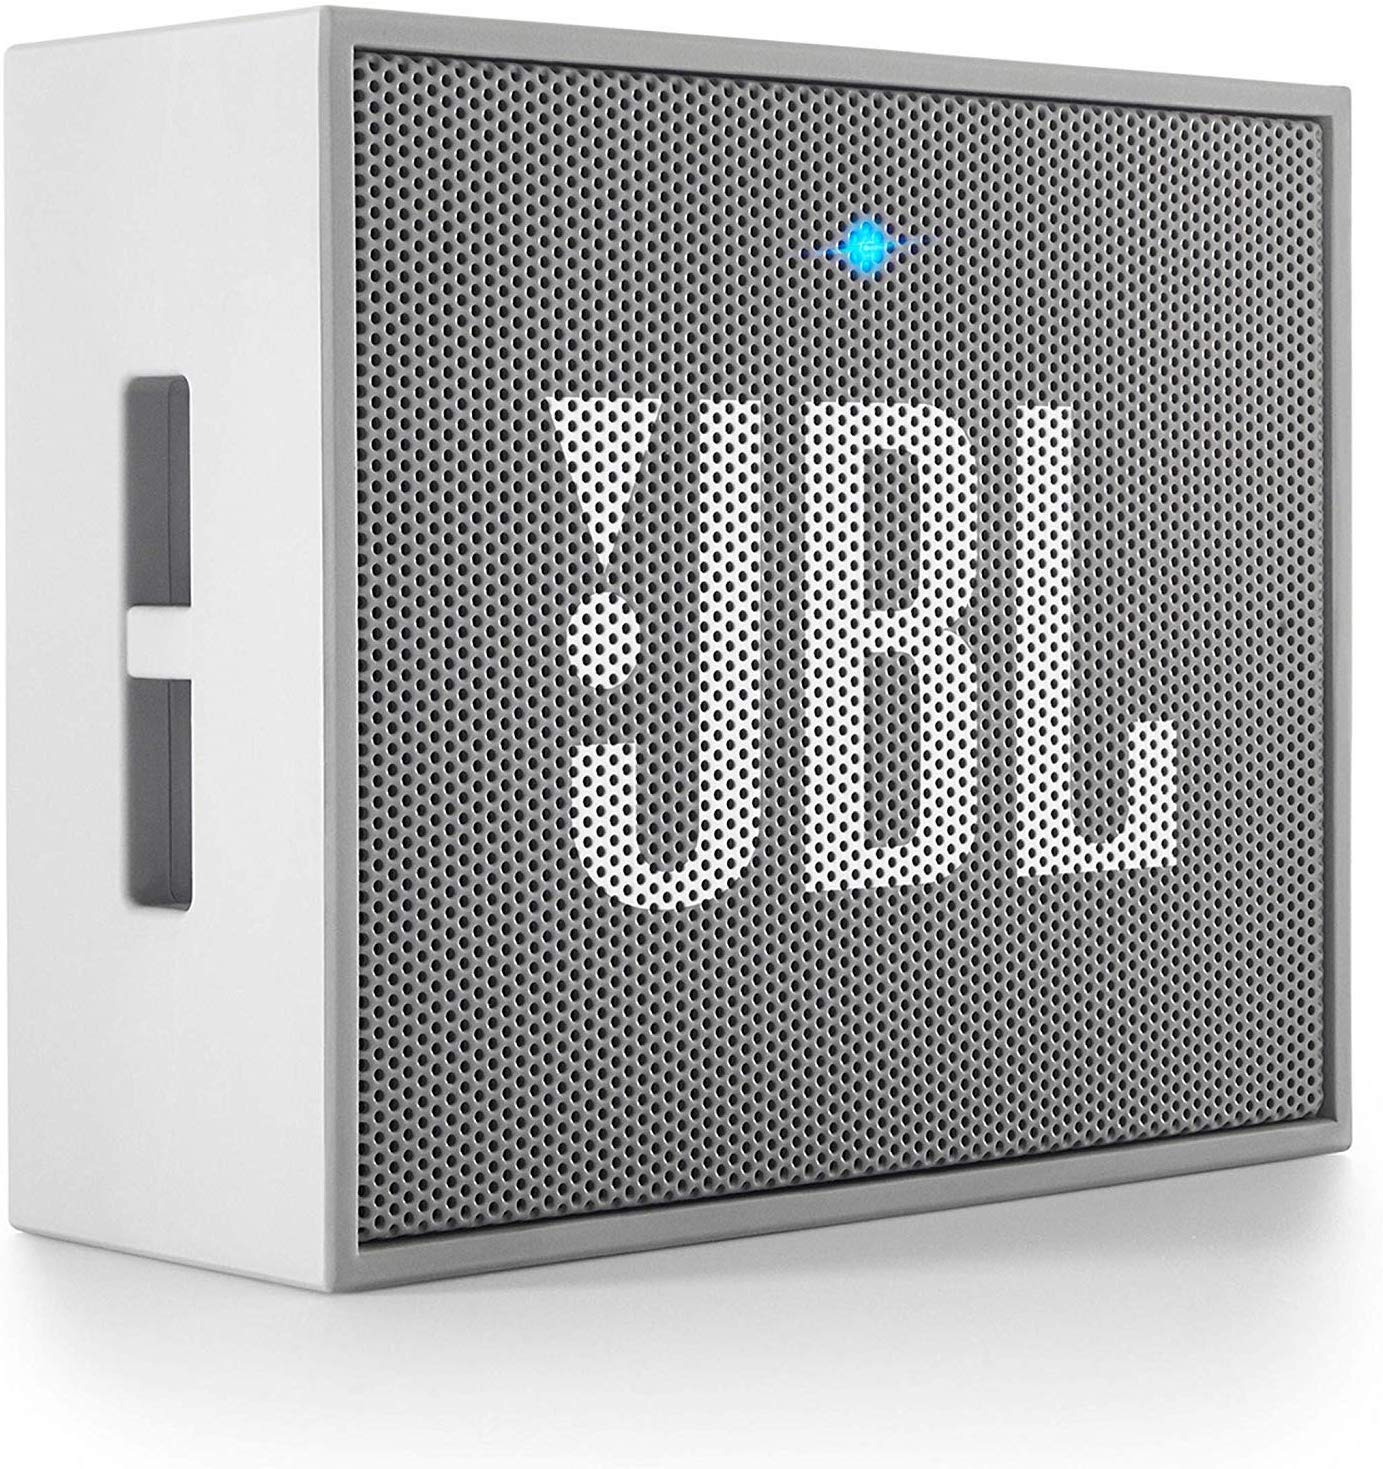 Jbl Go K951021 - Altavoz Portátil para Smartphones, Tablets y ...